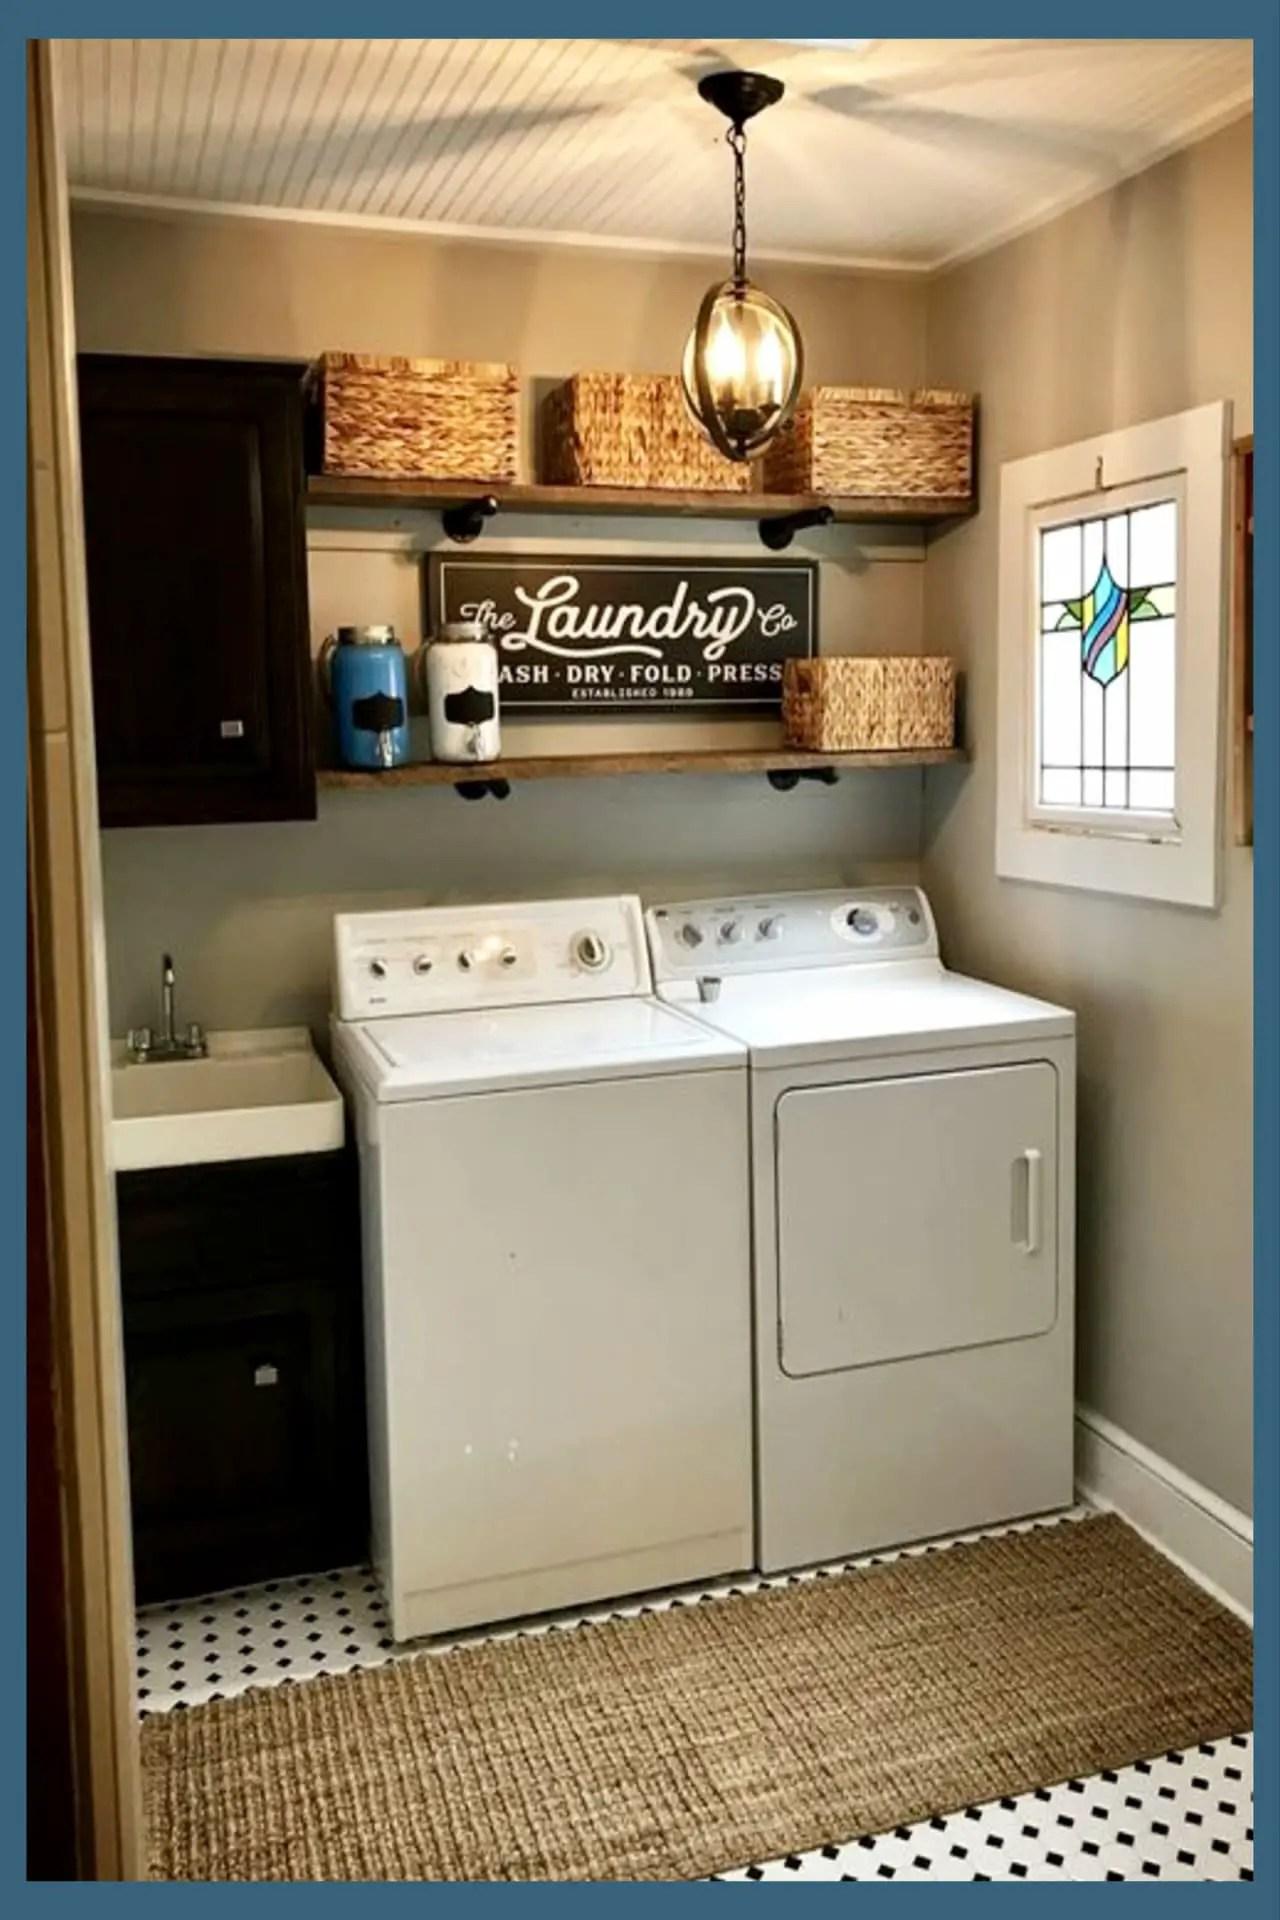 Small Laundry Room Ideas - Space Saving Ideas for Tiny ... on Small Laundry Room Organization Ideas  id=58318